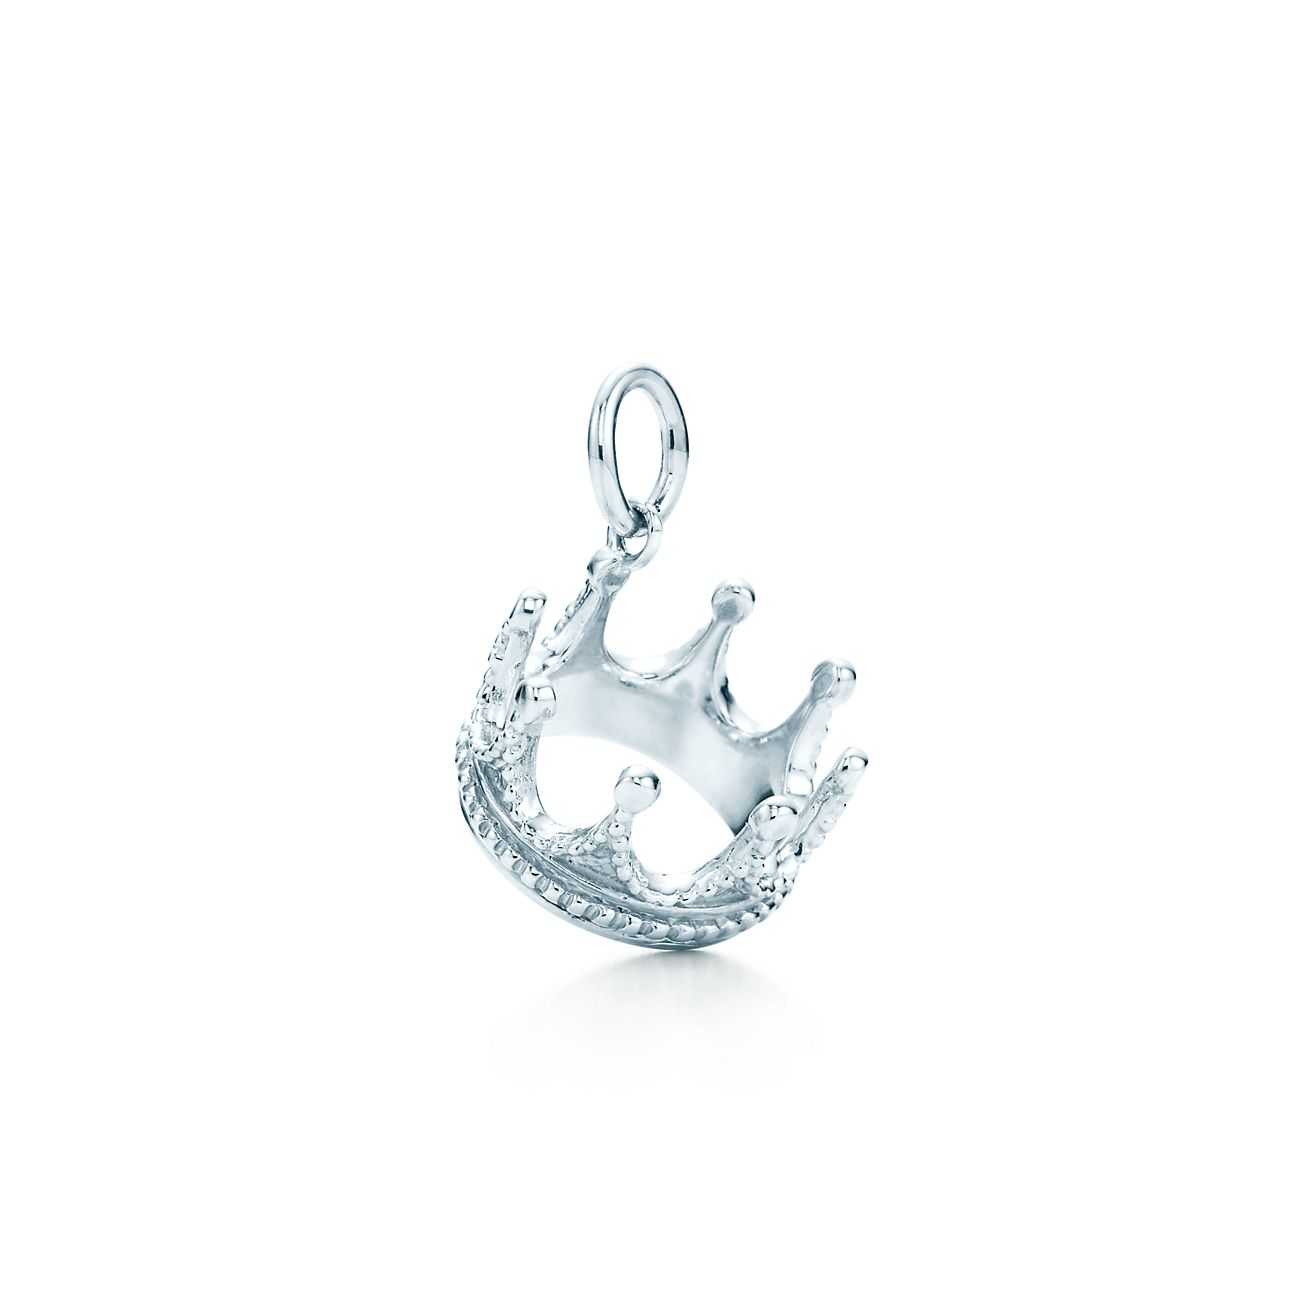 Jewelry Tiffany Charms Crown Charm 23457814 Cheap Tiffany Charms